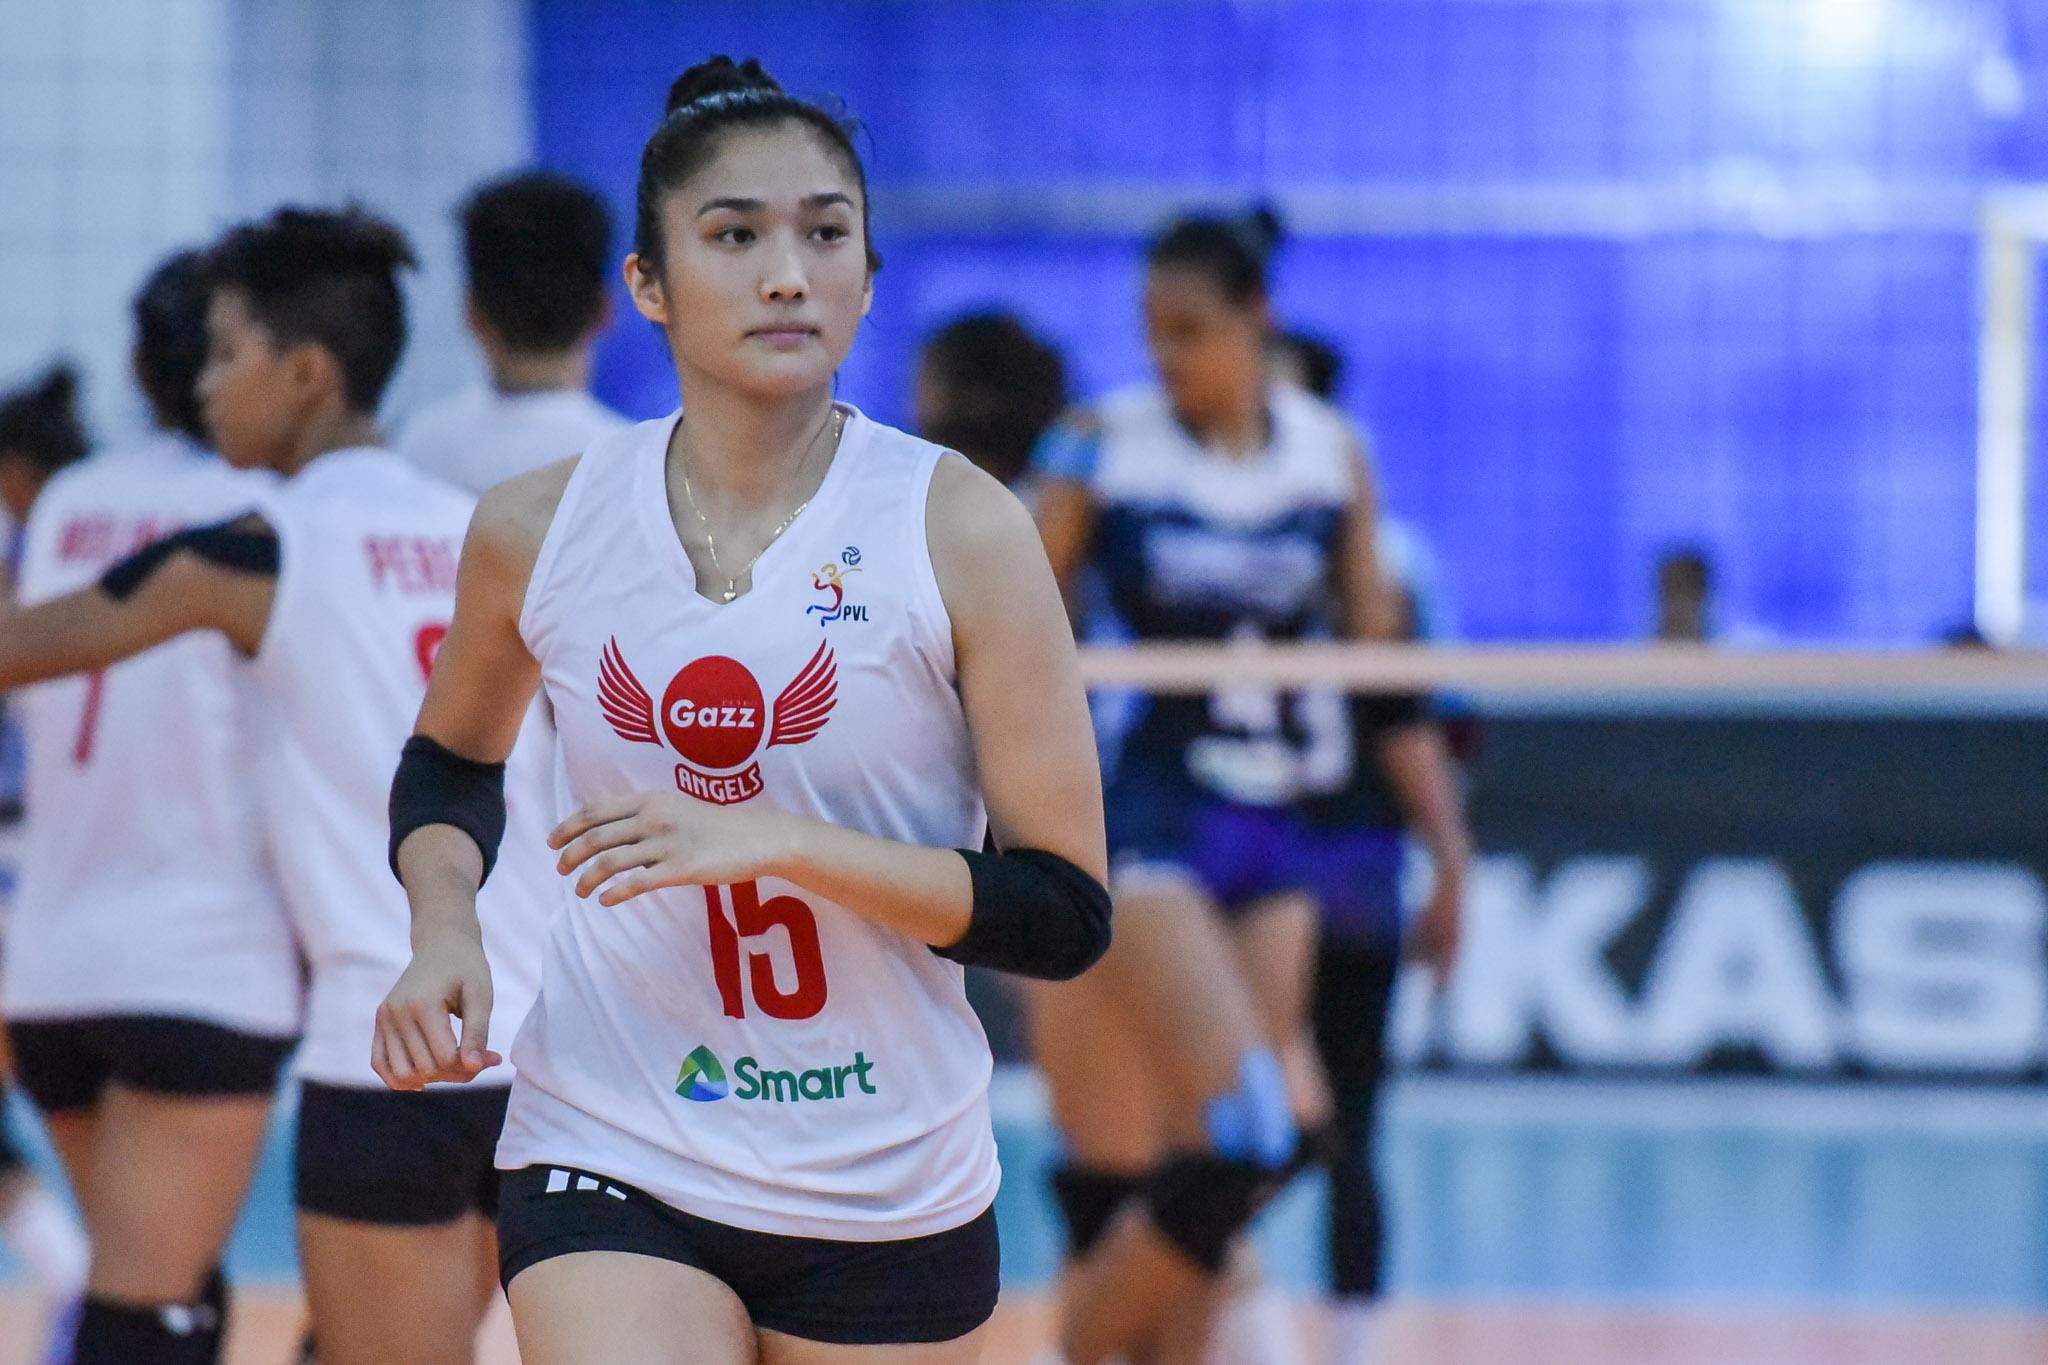 2021-PVL-Open-Balipure-vs.-Petrogazz-Jer-Malabanan-6307 Myla Pablo believes Petro Gazz has yet to reach peak News PVL Volleyball  - philippine sports news